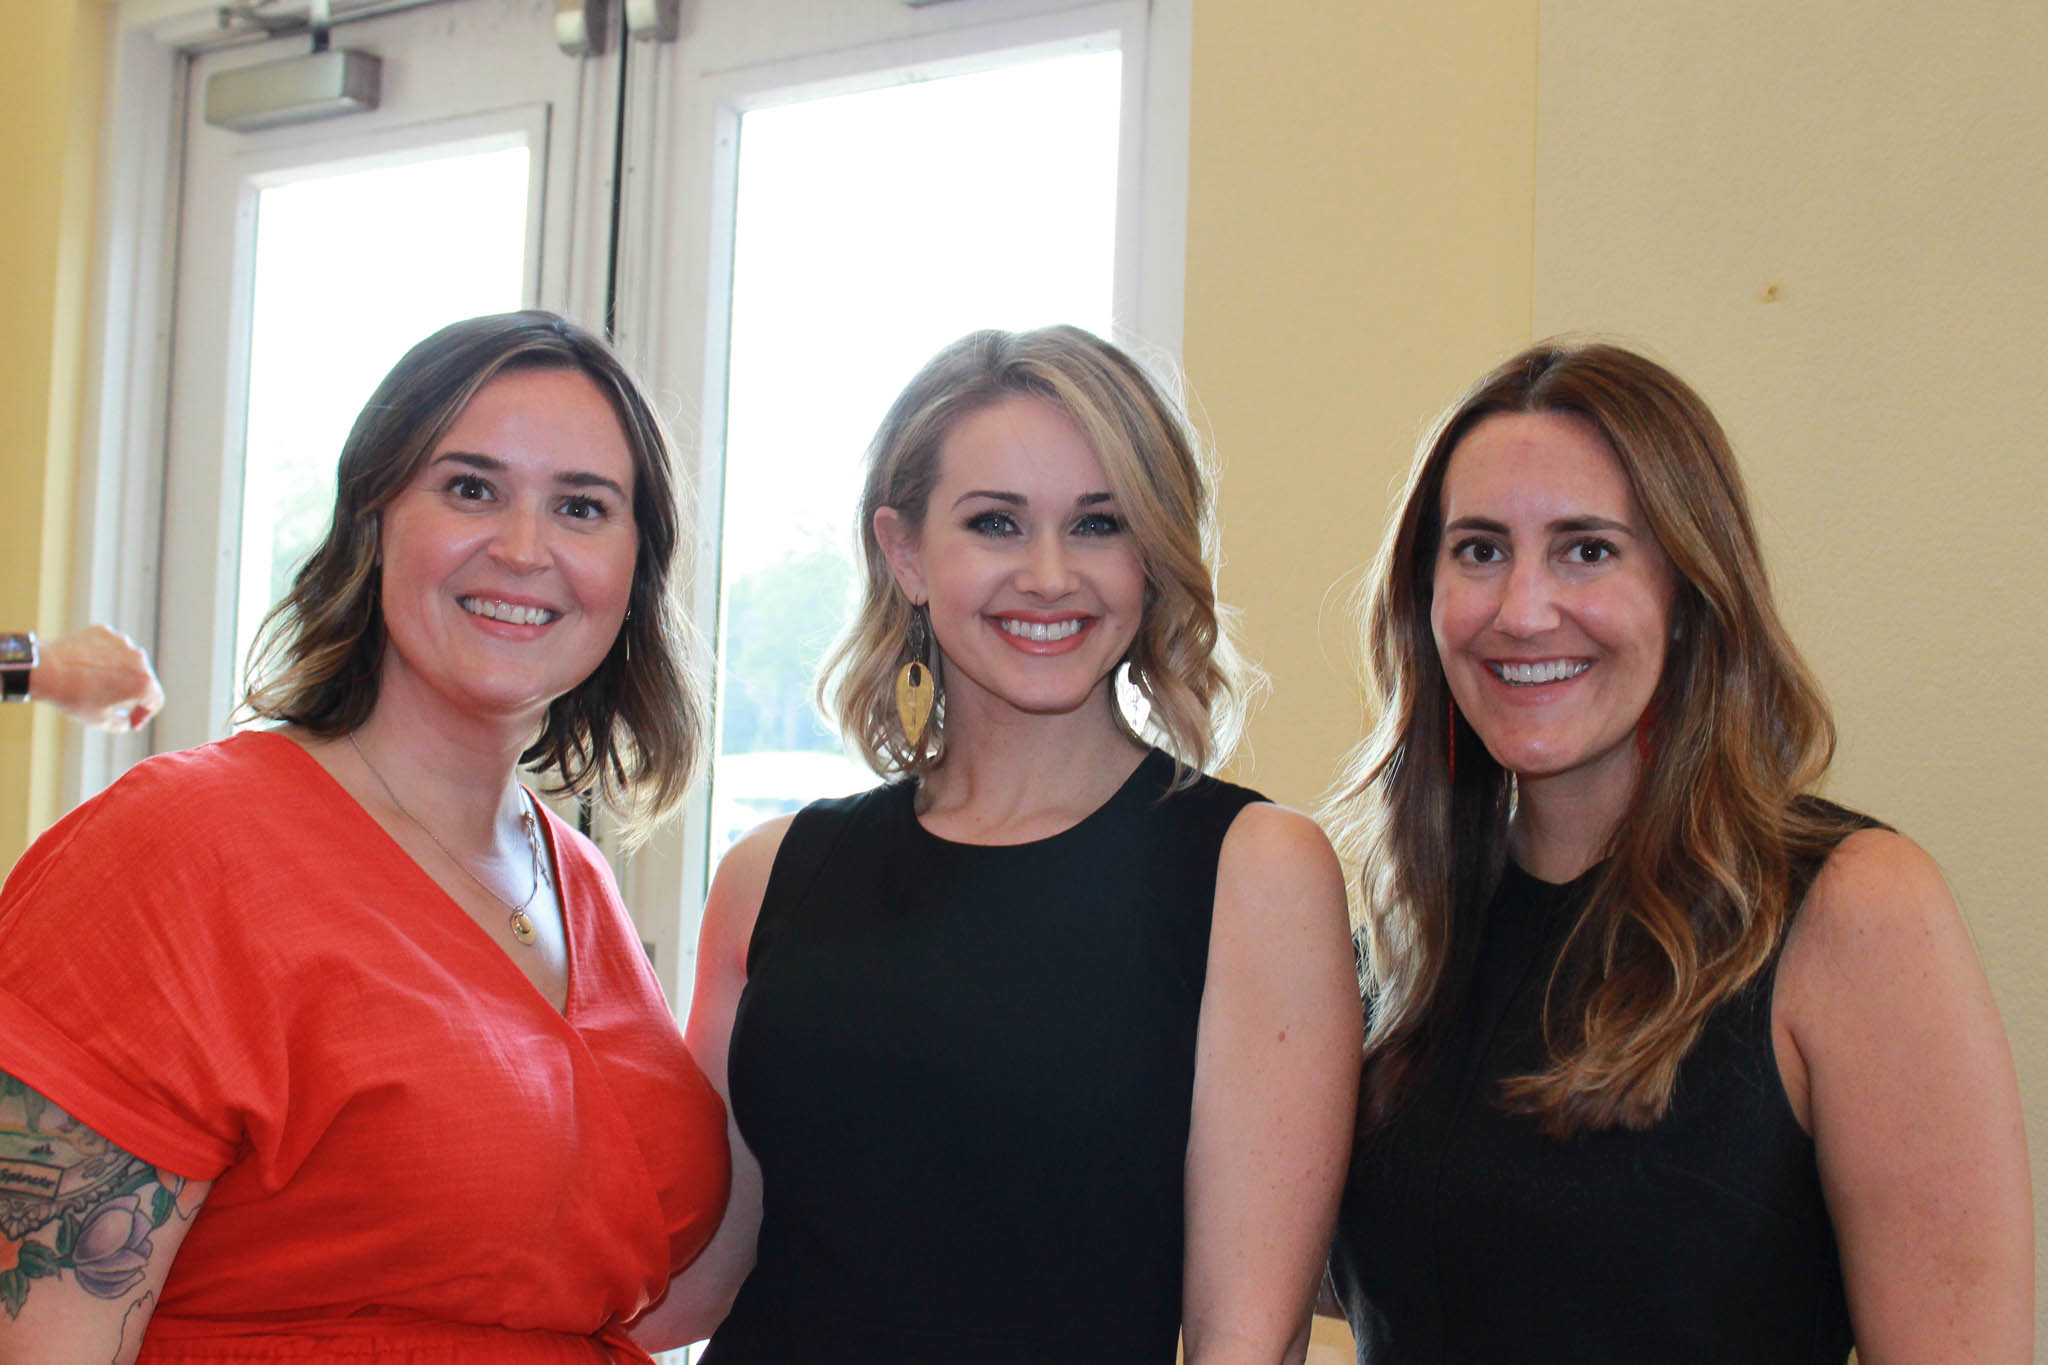 Samantha Whitlow, Taylor Barr and Jordan Miller